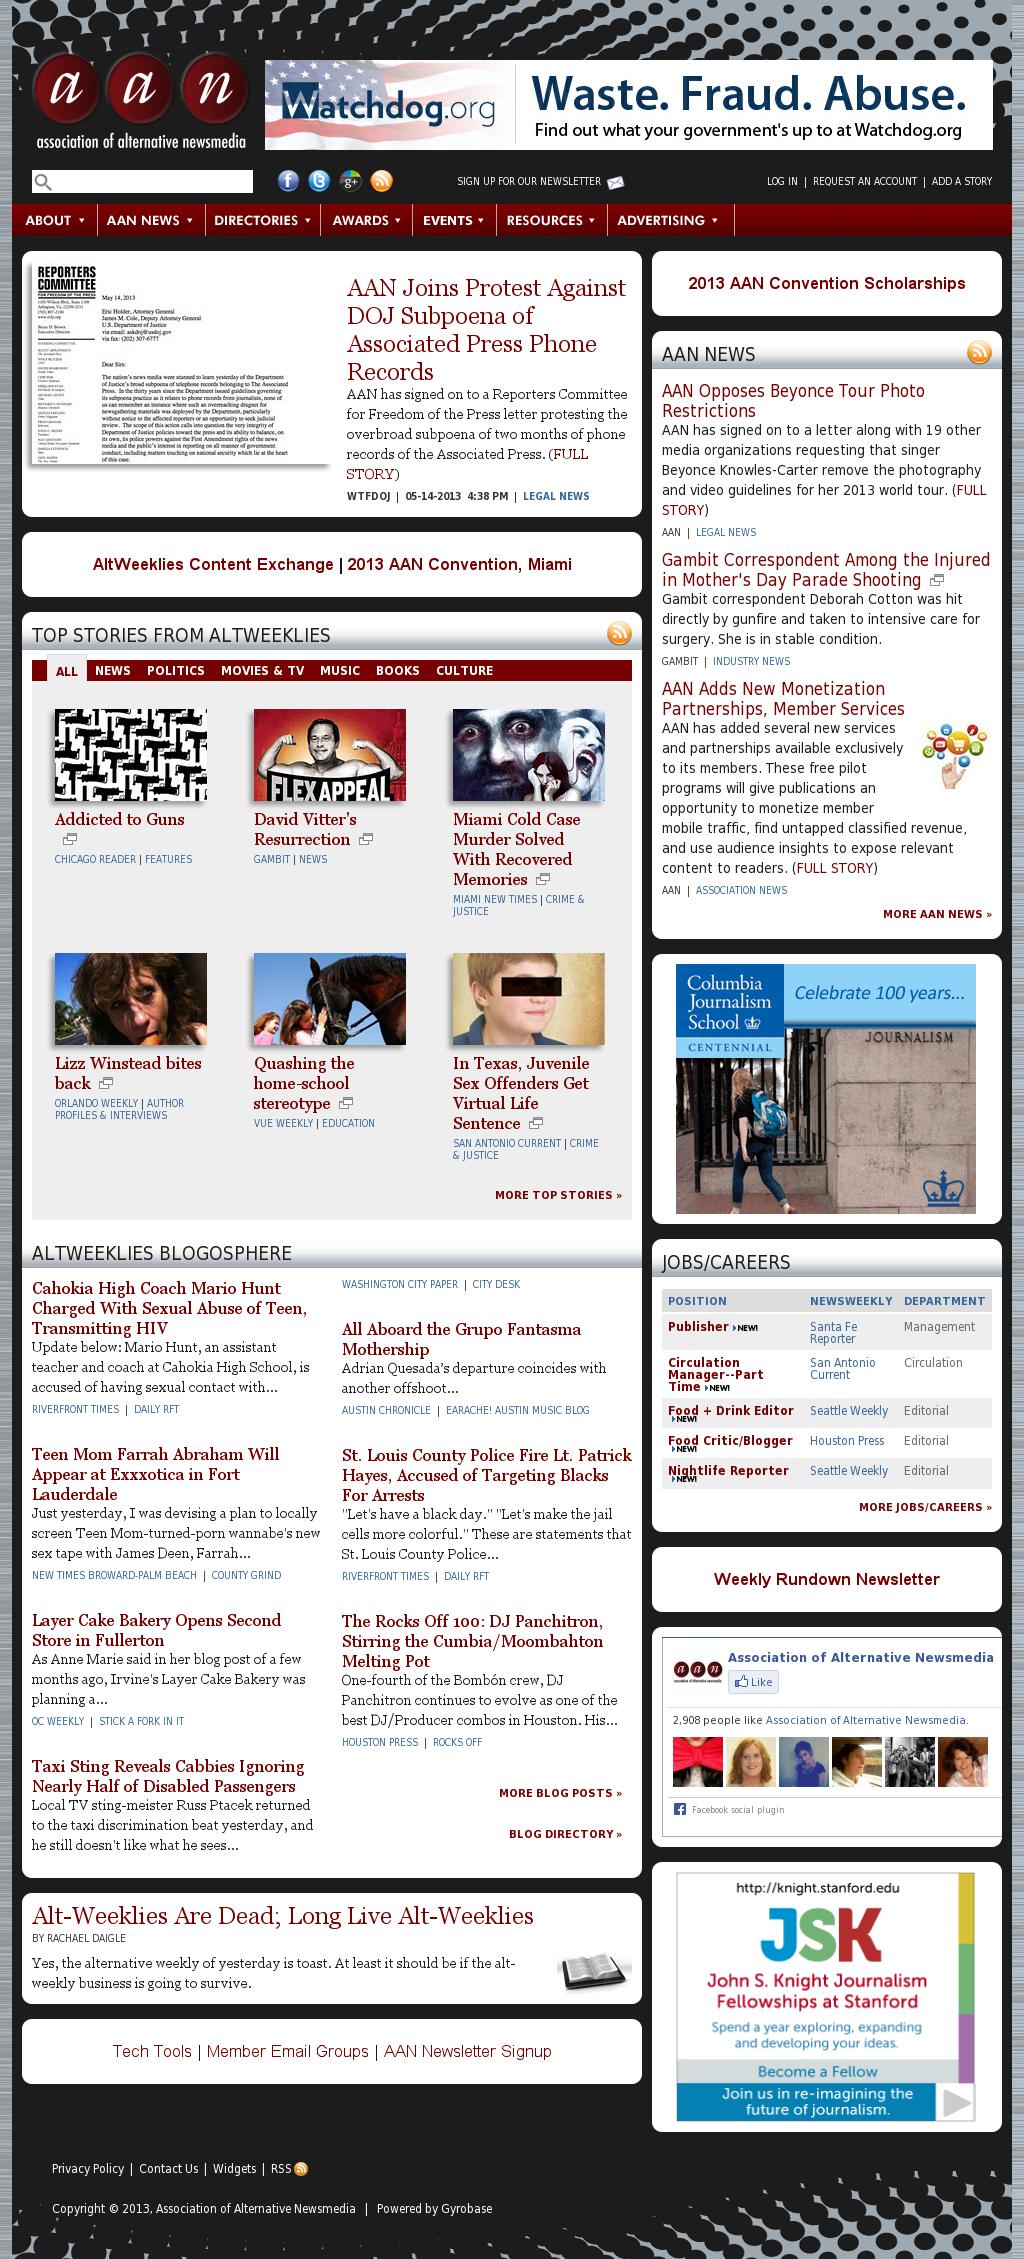 Association of Alternative Newsmedia at Wednesday May 15, 2013, 3 a.m. UTC